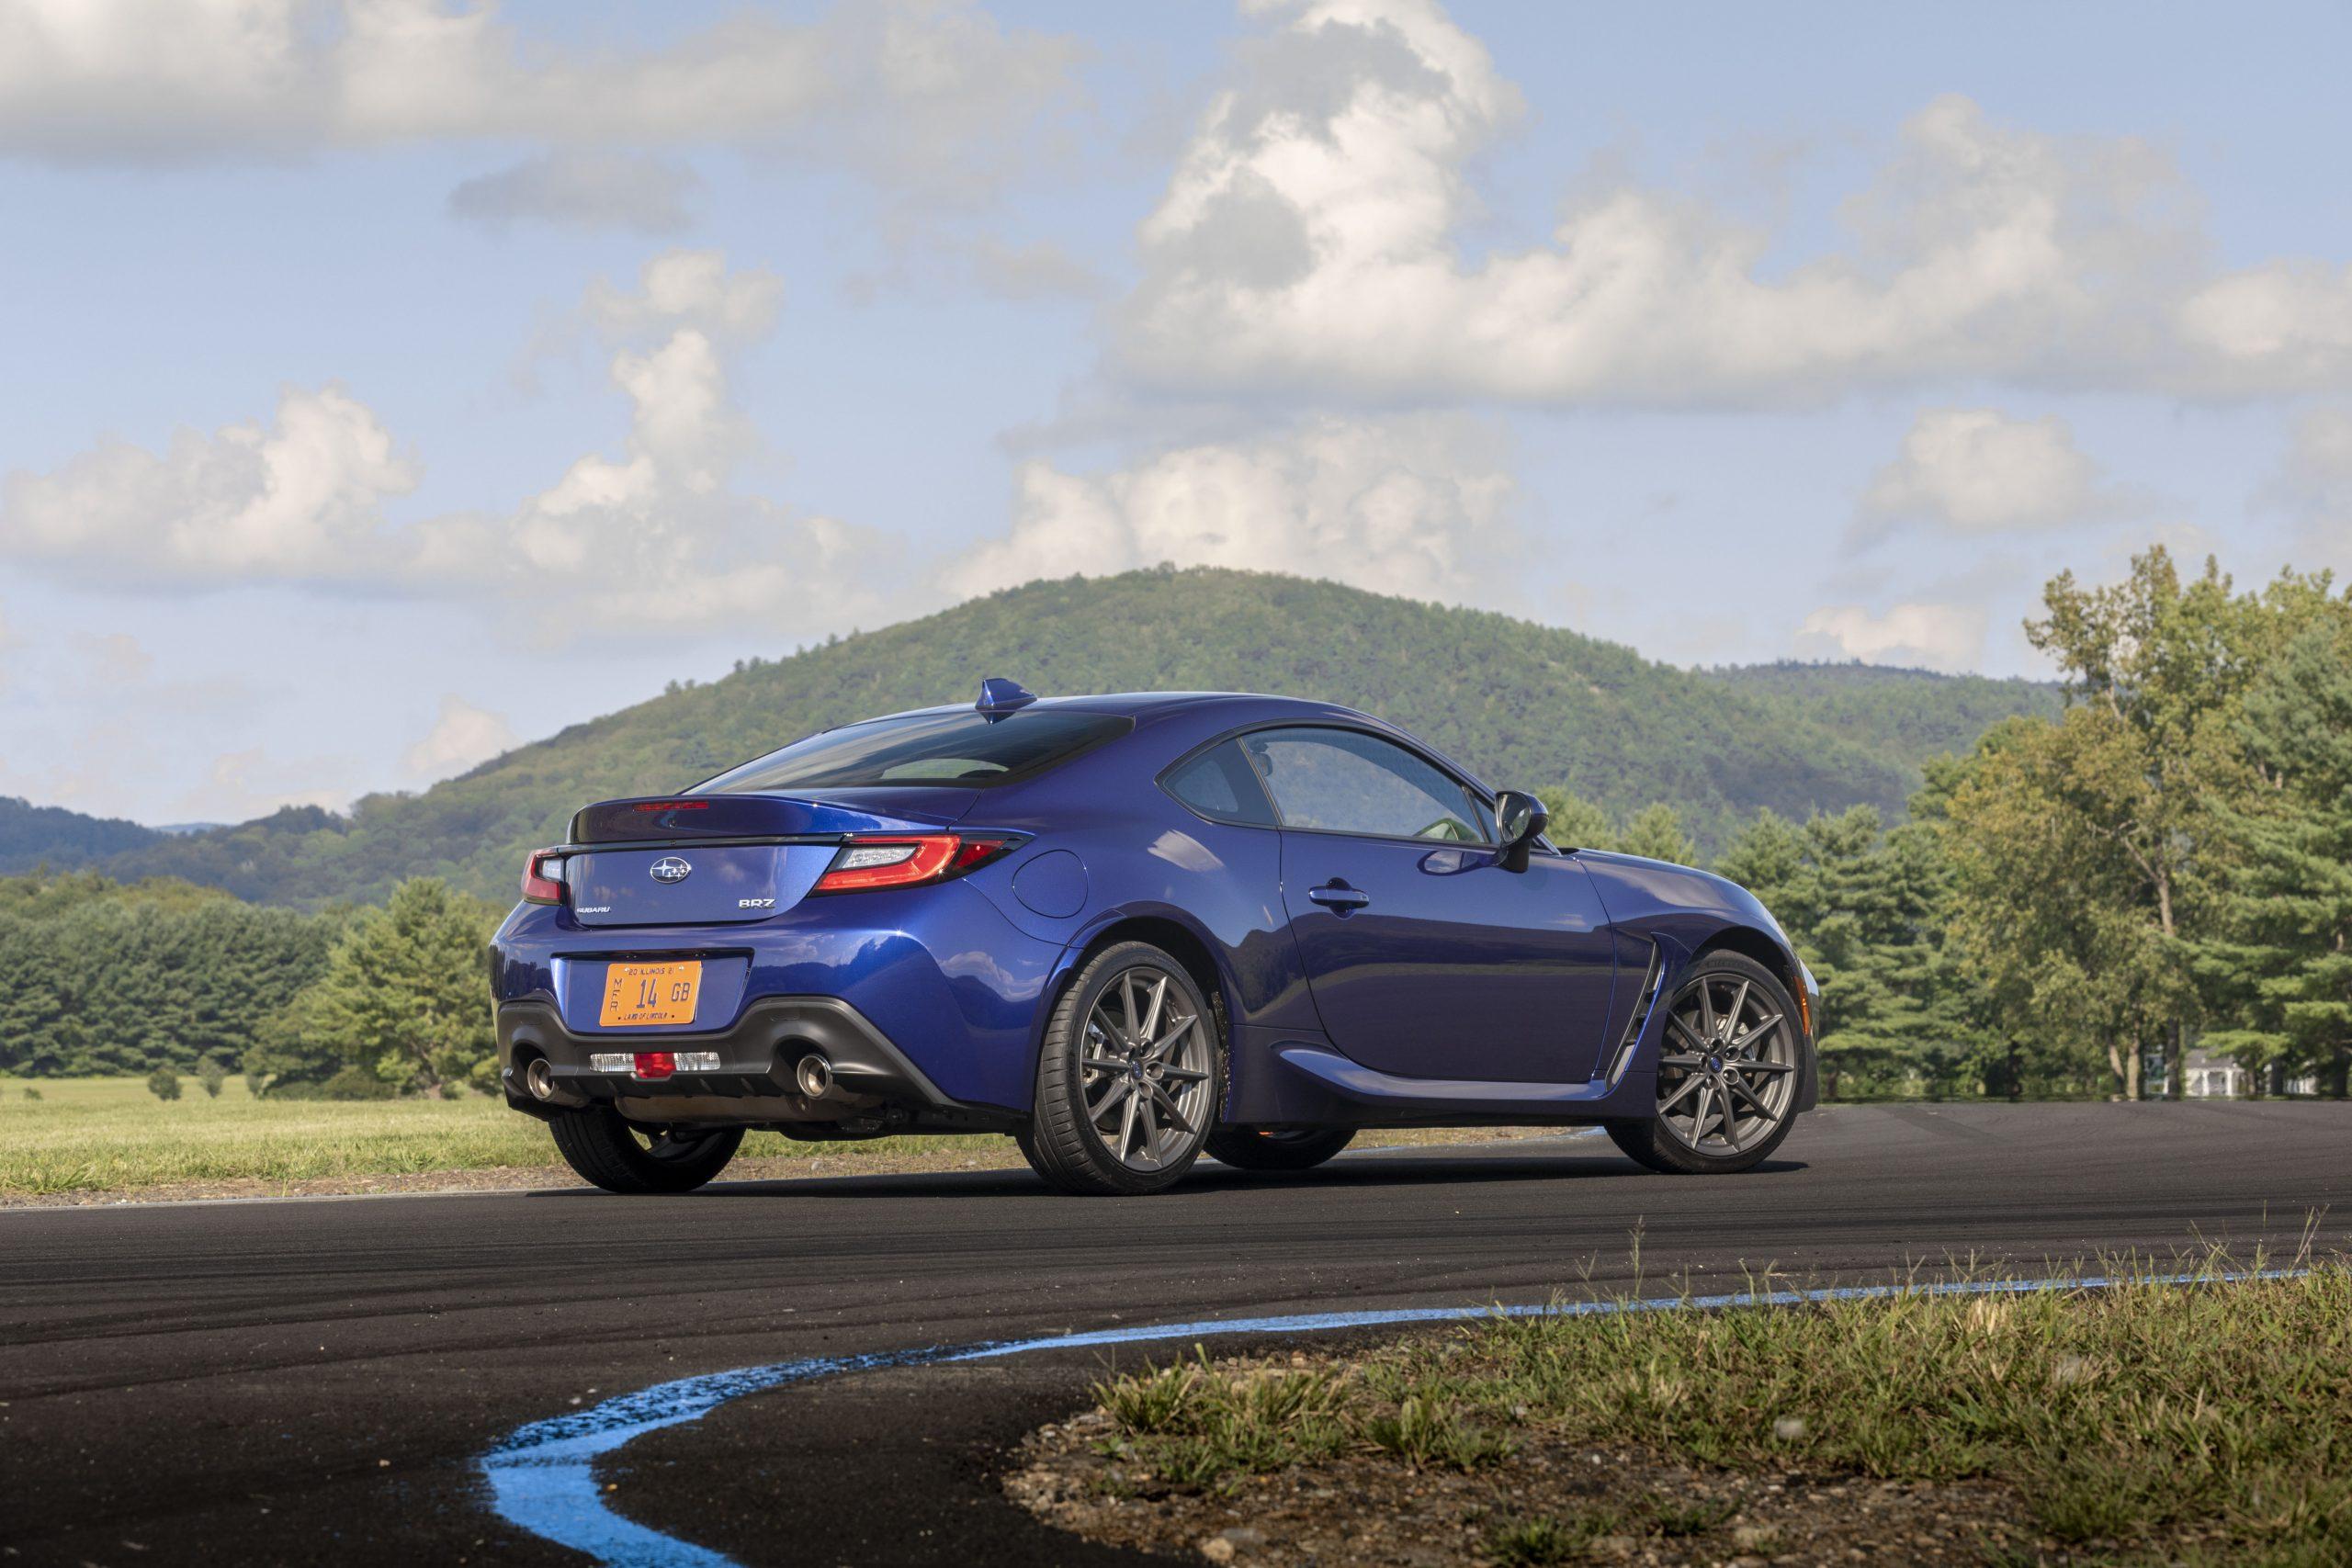 2022 Subaru BRZ rear three-quarter